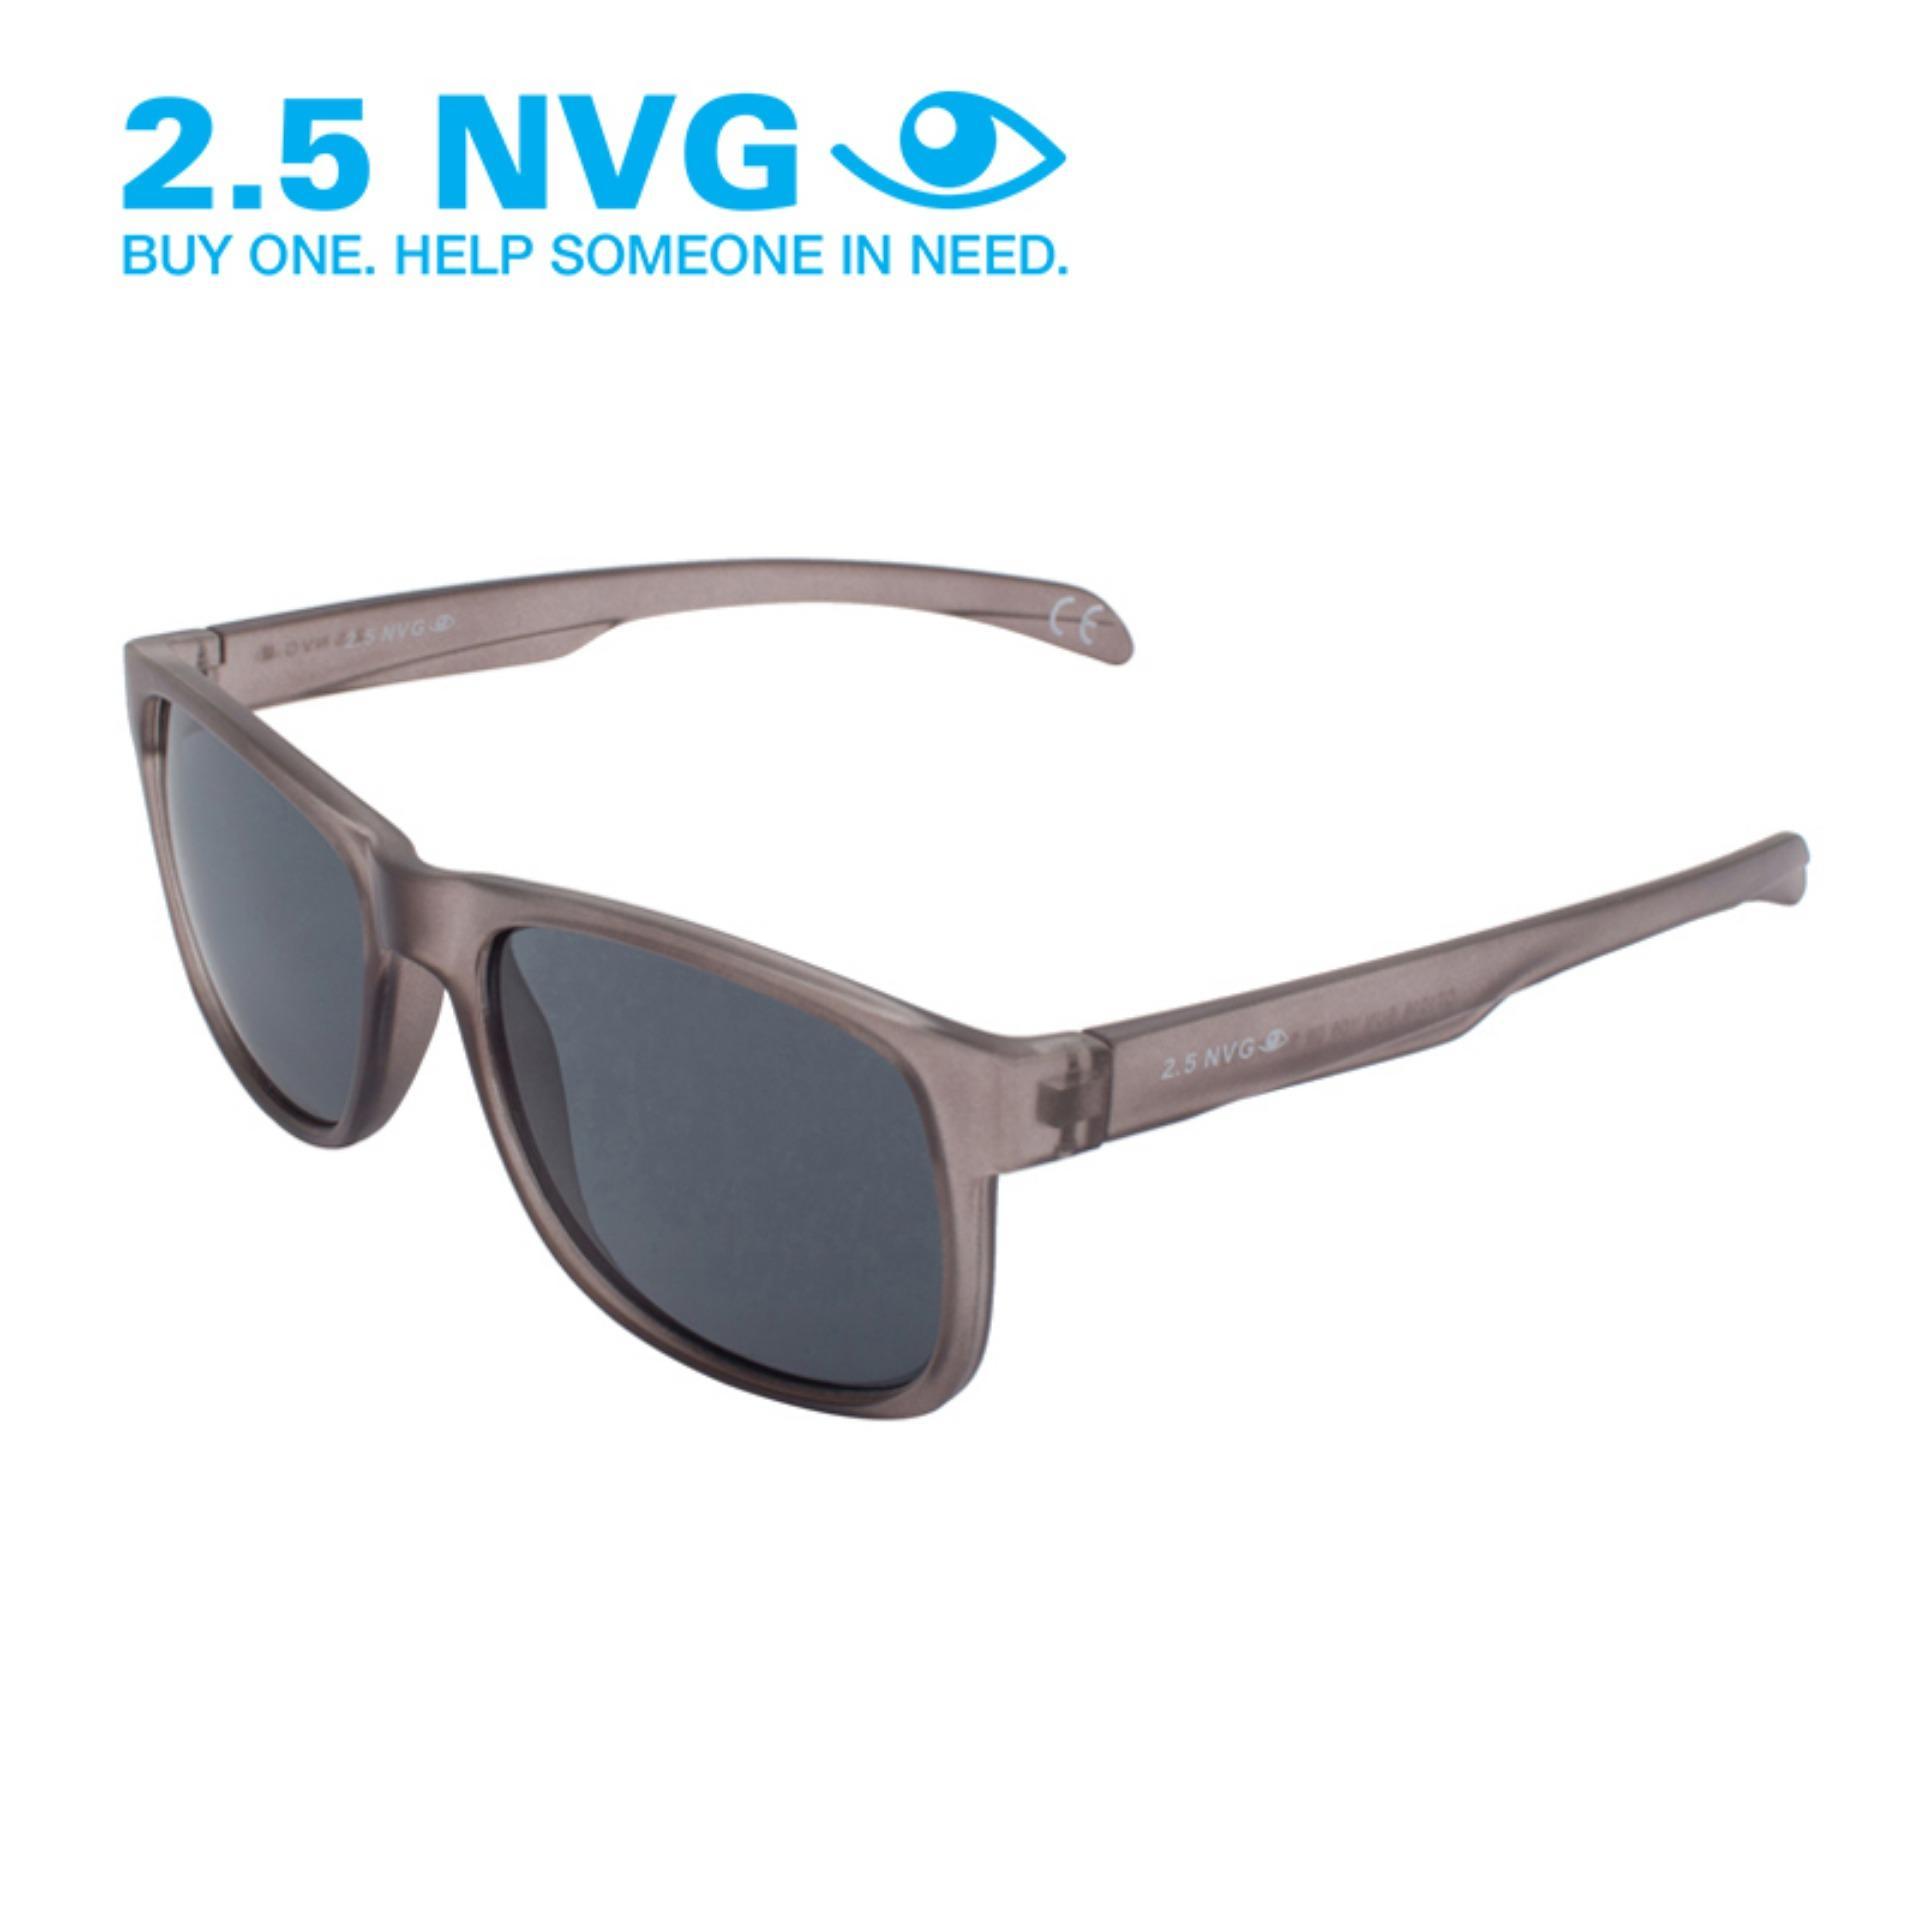 Jual Beli 2 5 Nvg Kacamata Pria Cokelat Persegi Panjang Proteksi Uv 400 Lensa Hitam Sun 105 08